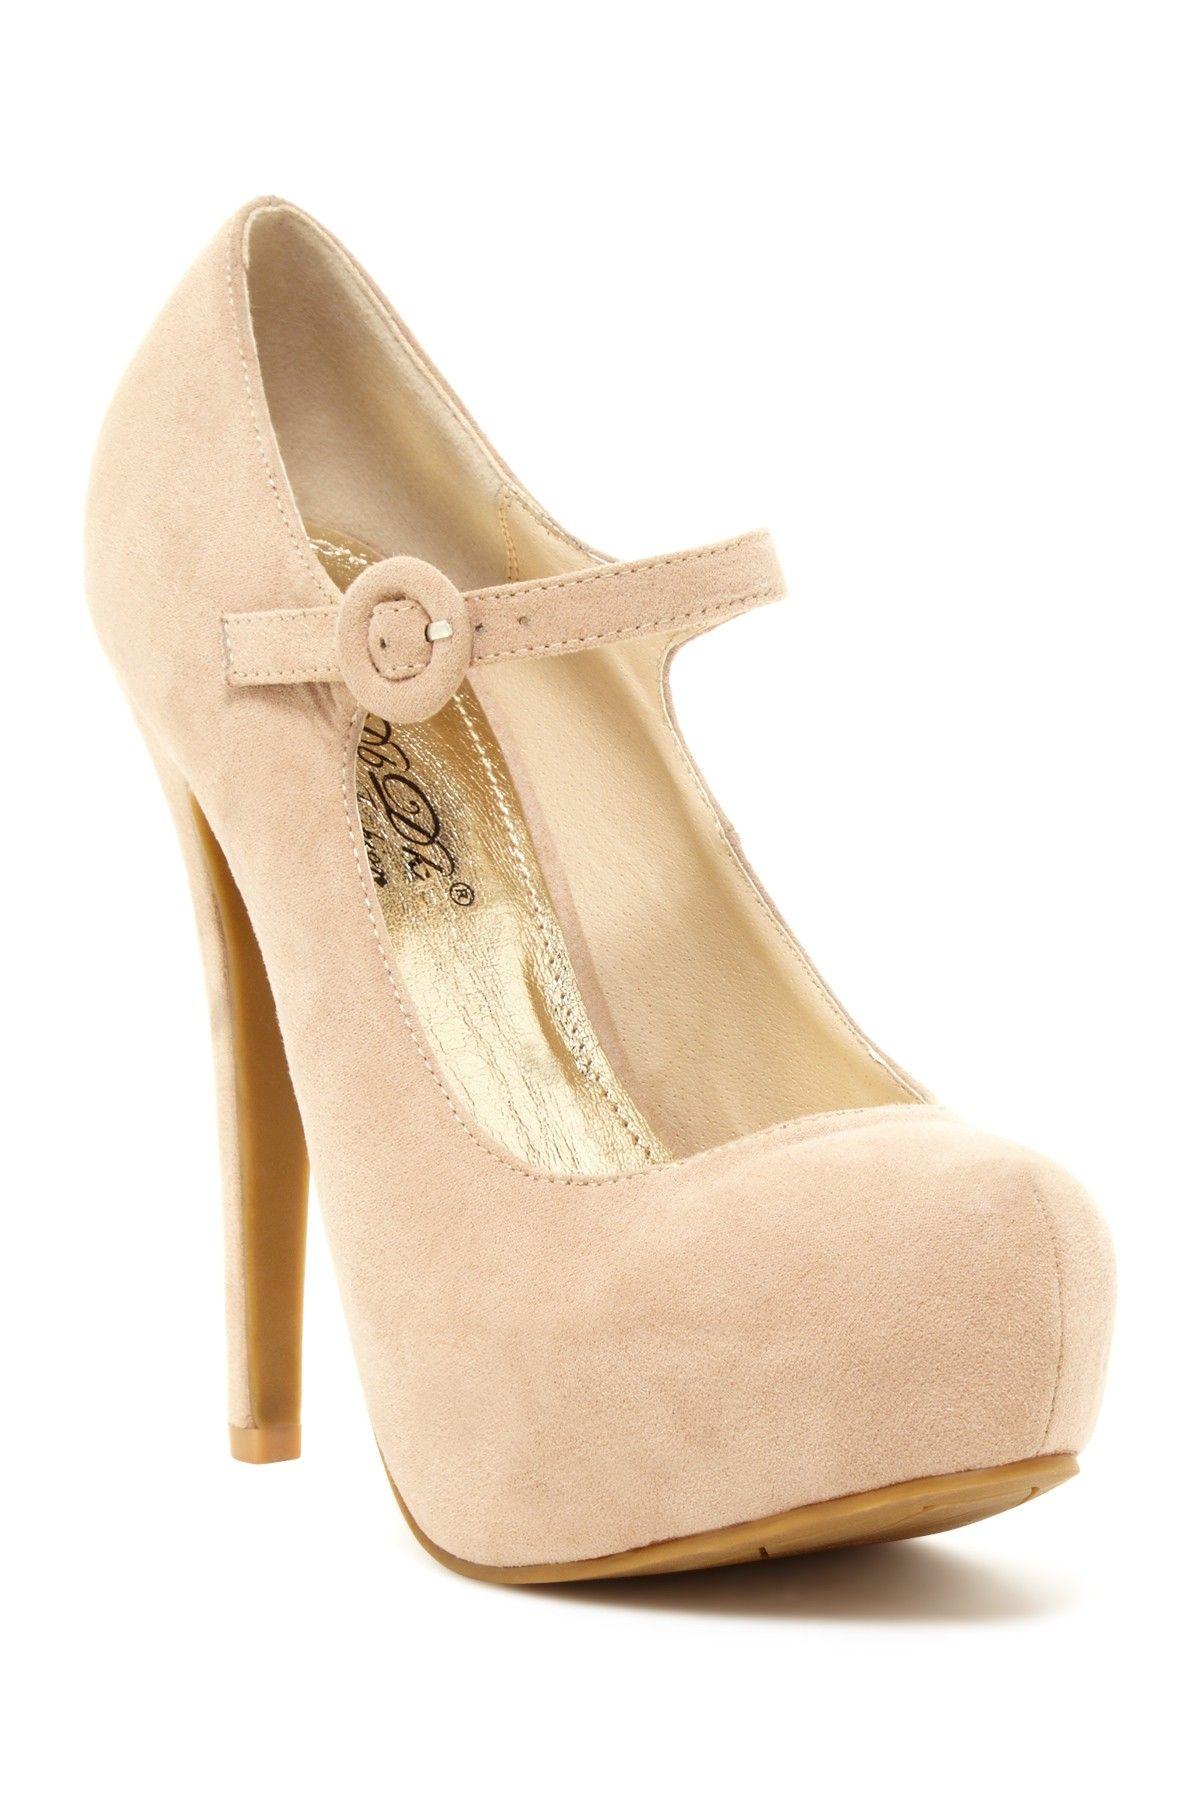 Nulinda Mary Jane Pumps // elegant